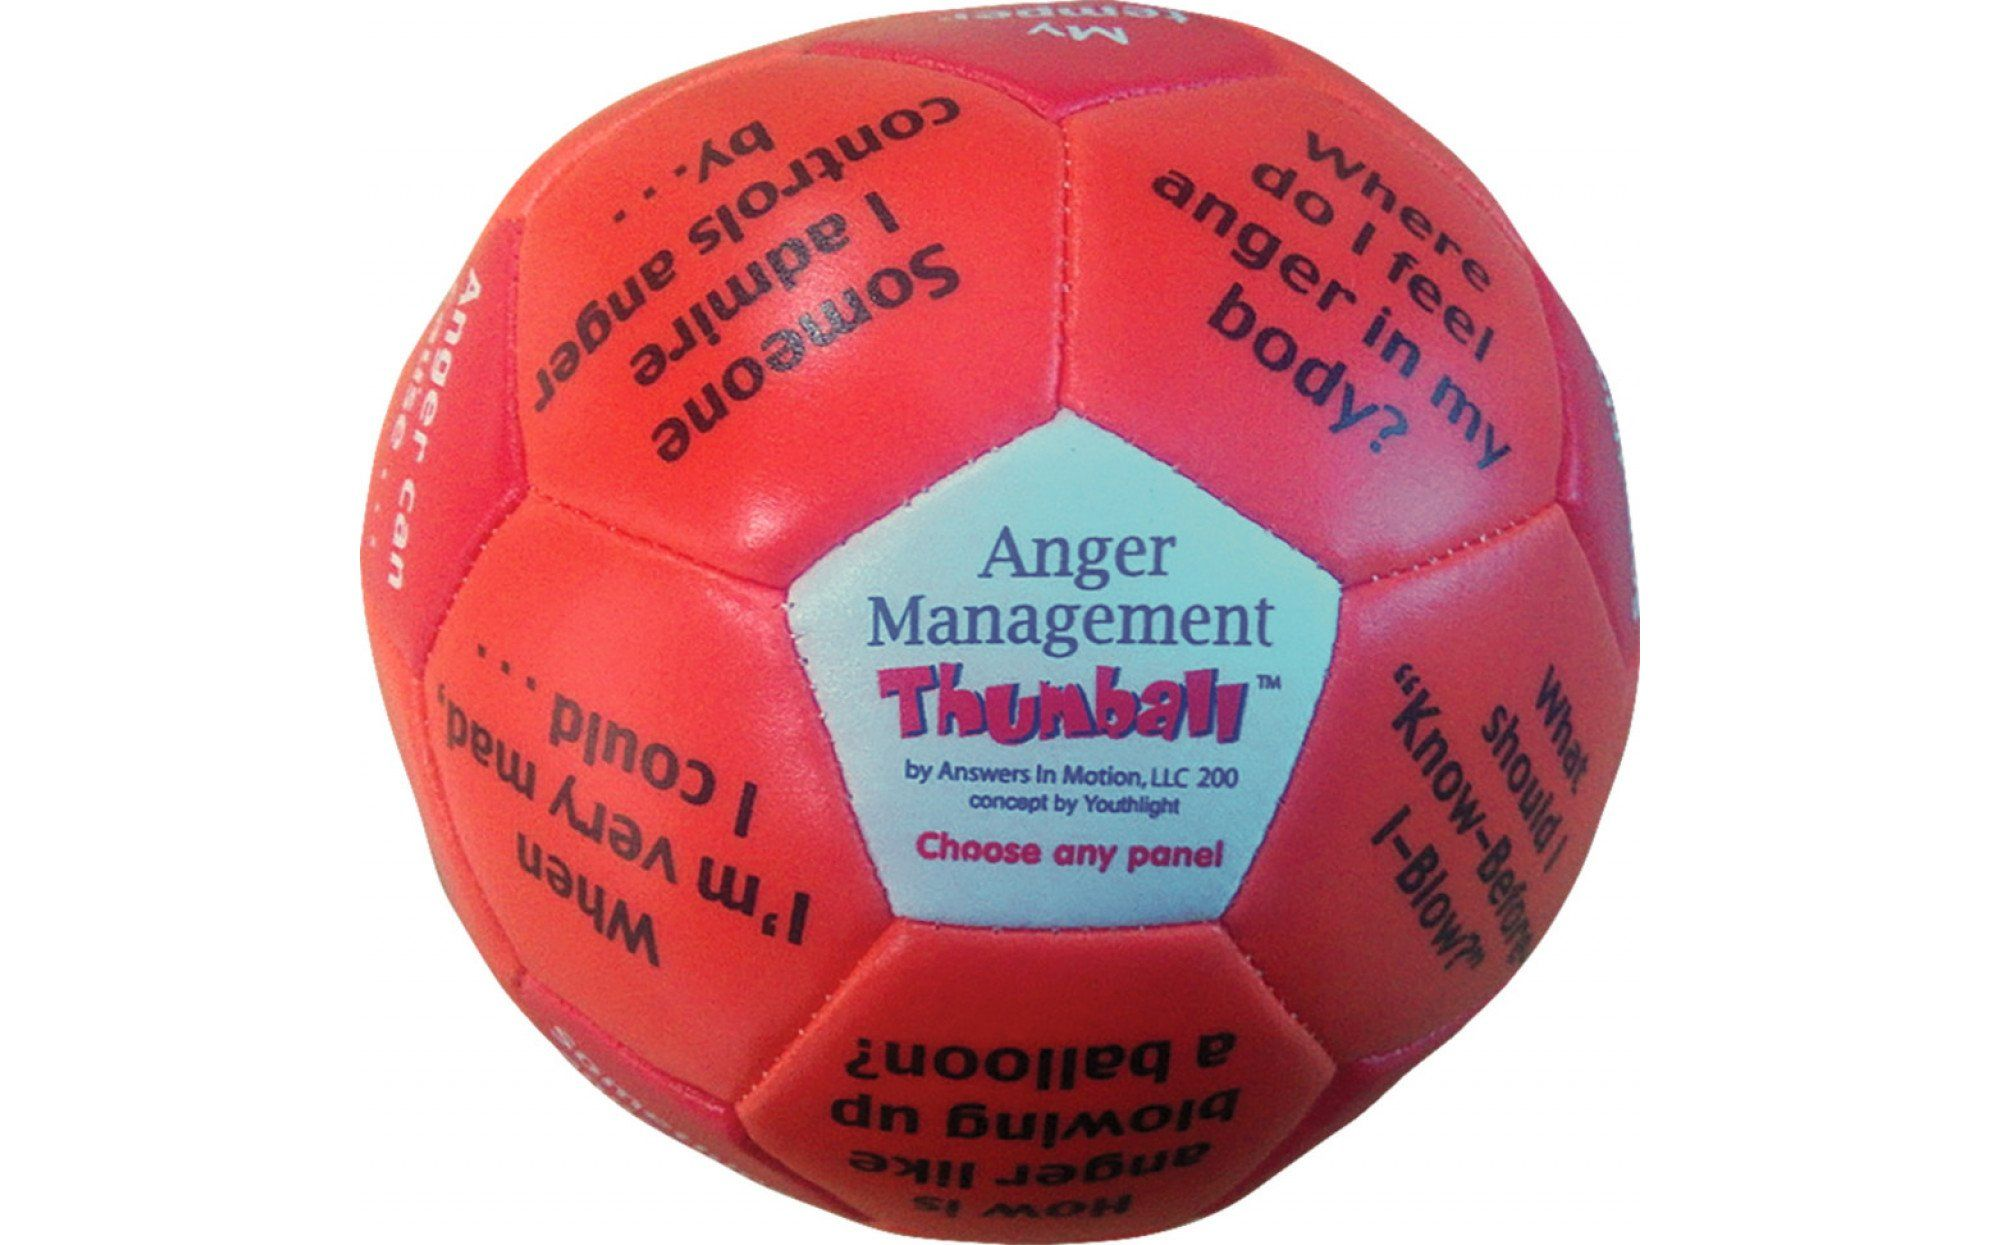 Anger Management Thumball